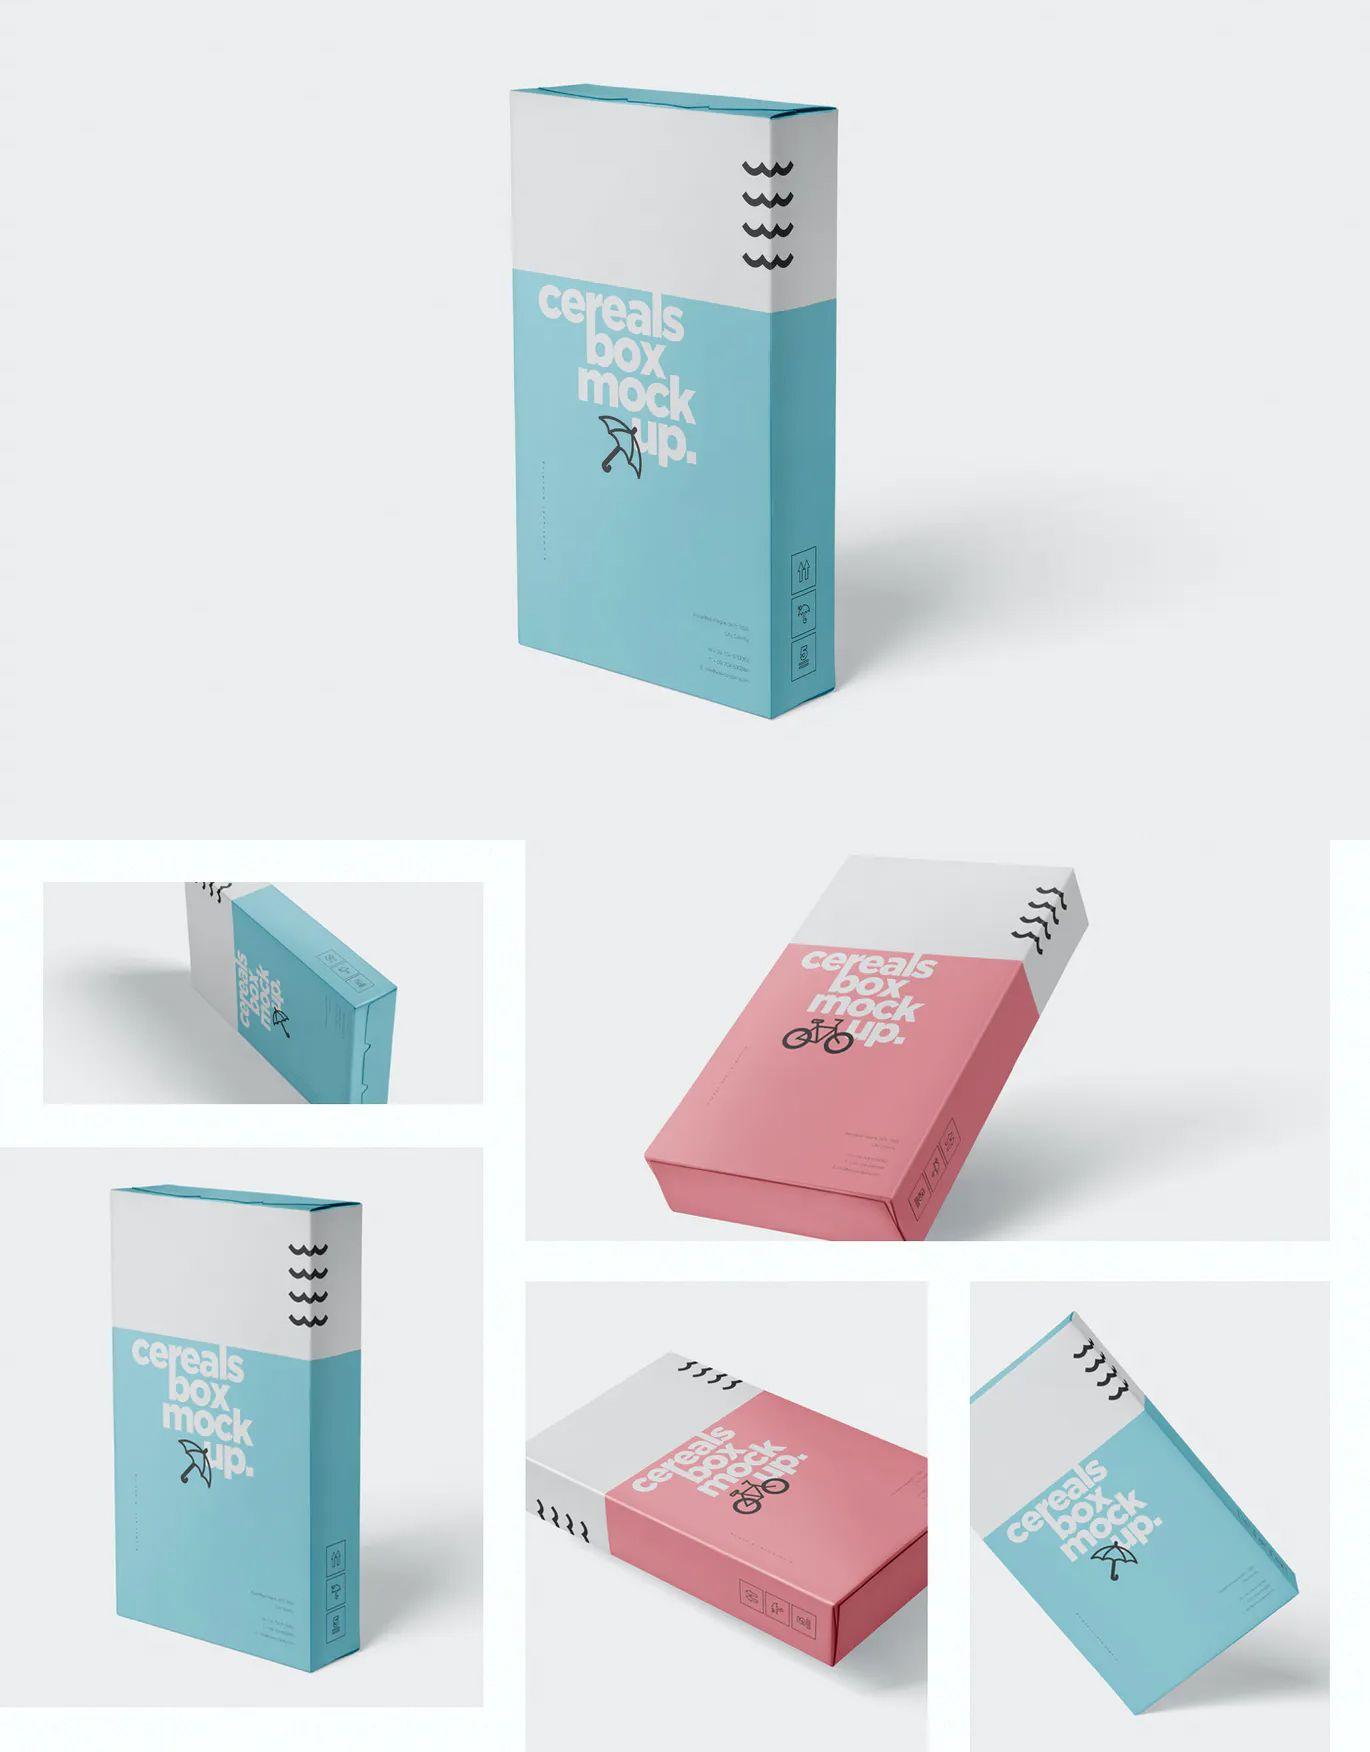 Download Cereals Box Mockup Slim Size Box By Gfxfoundry On Envato Elements Box Mockup Cereal Box Mockup